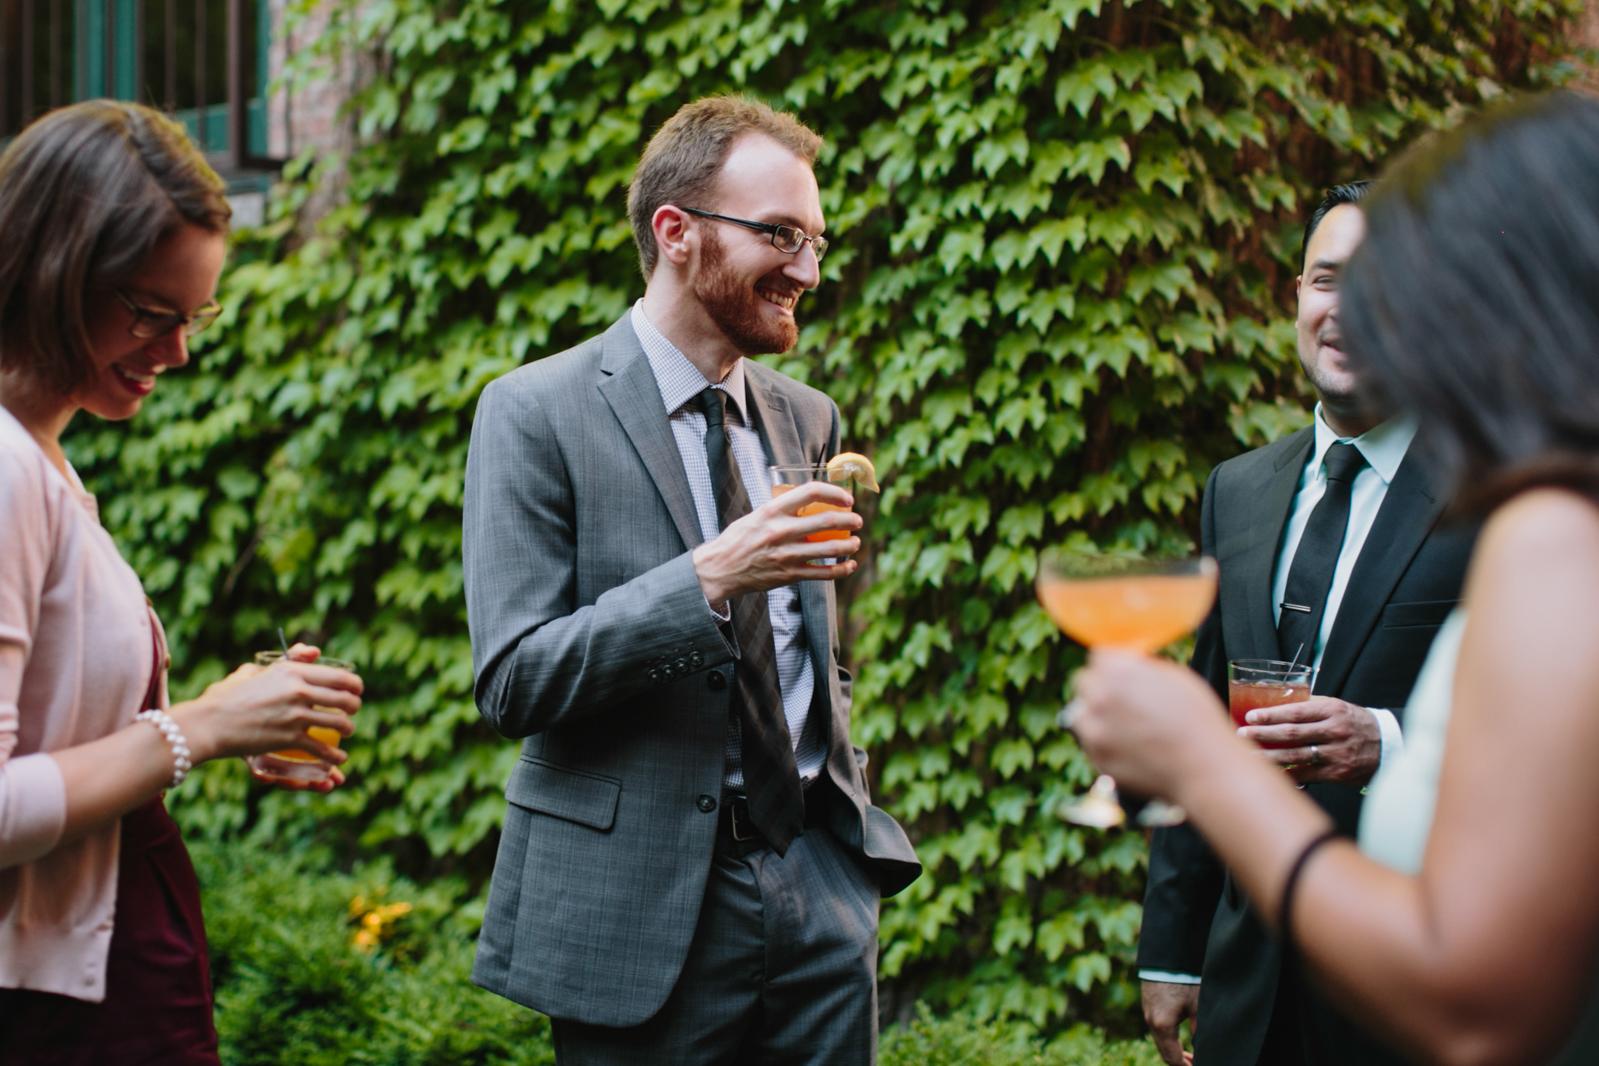 Outdoor Wedding at the Ivy Room Chicago Wedding Photographer - Rachel and Luke-026.jpg